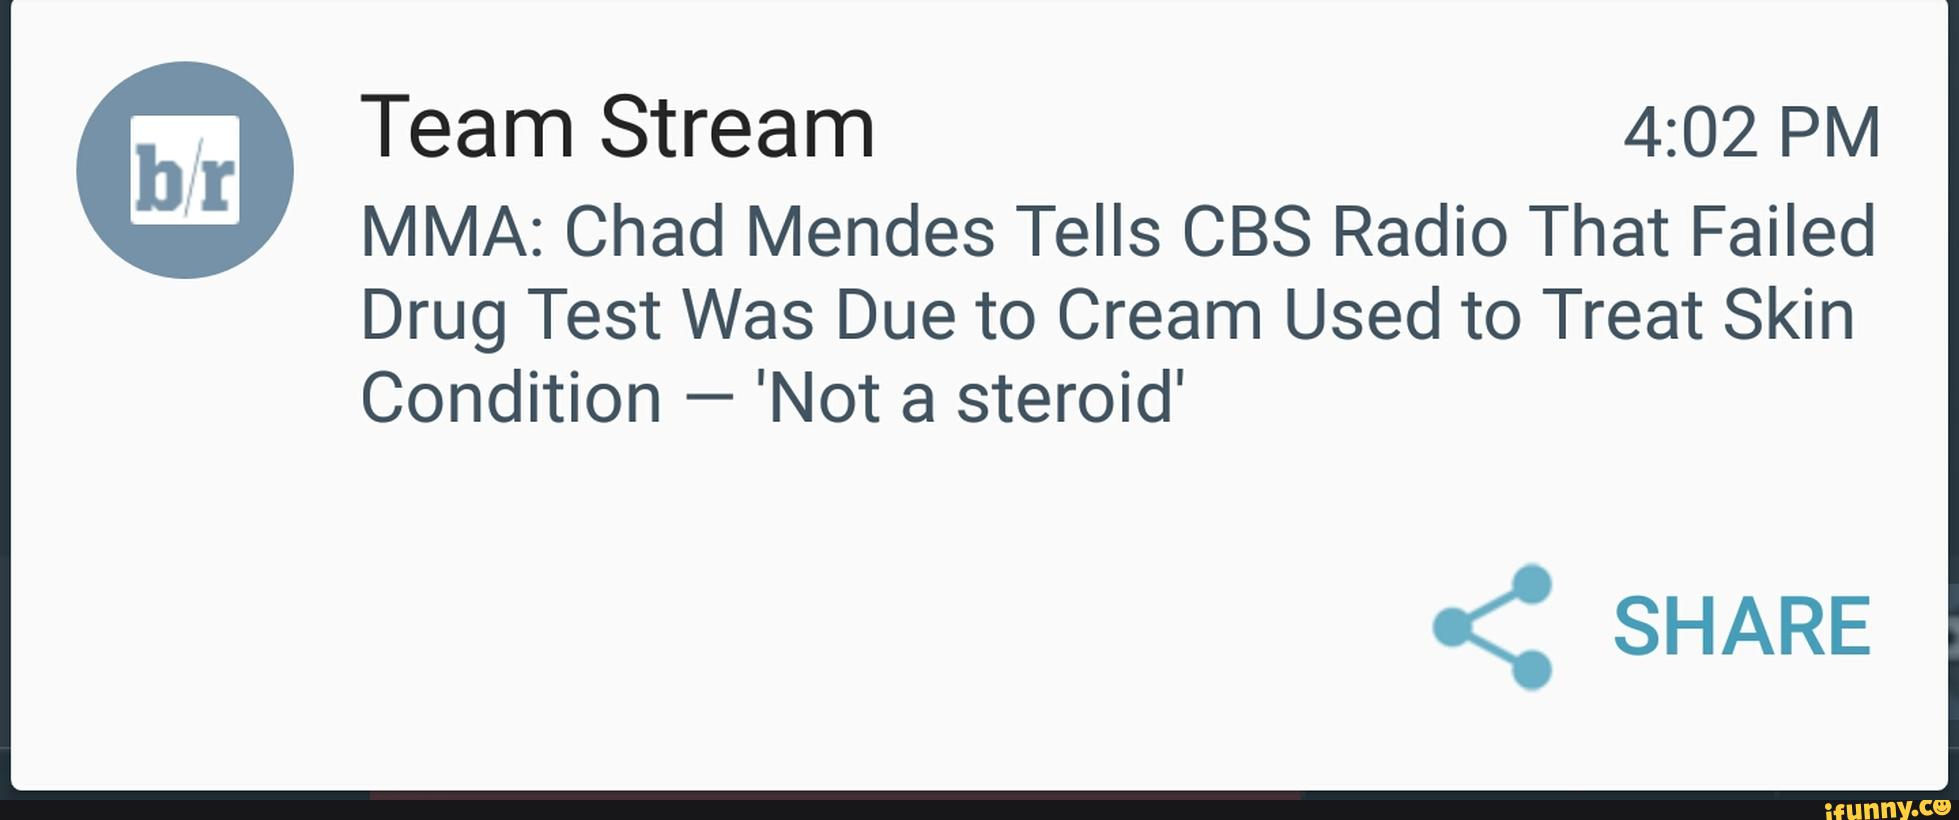 M Team Stream 4:02 PM MMA: Chad Mendes Tells CBS Radio That